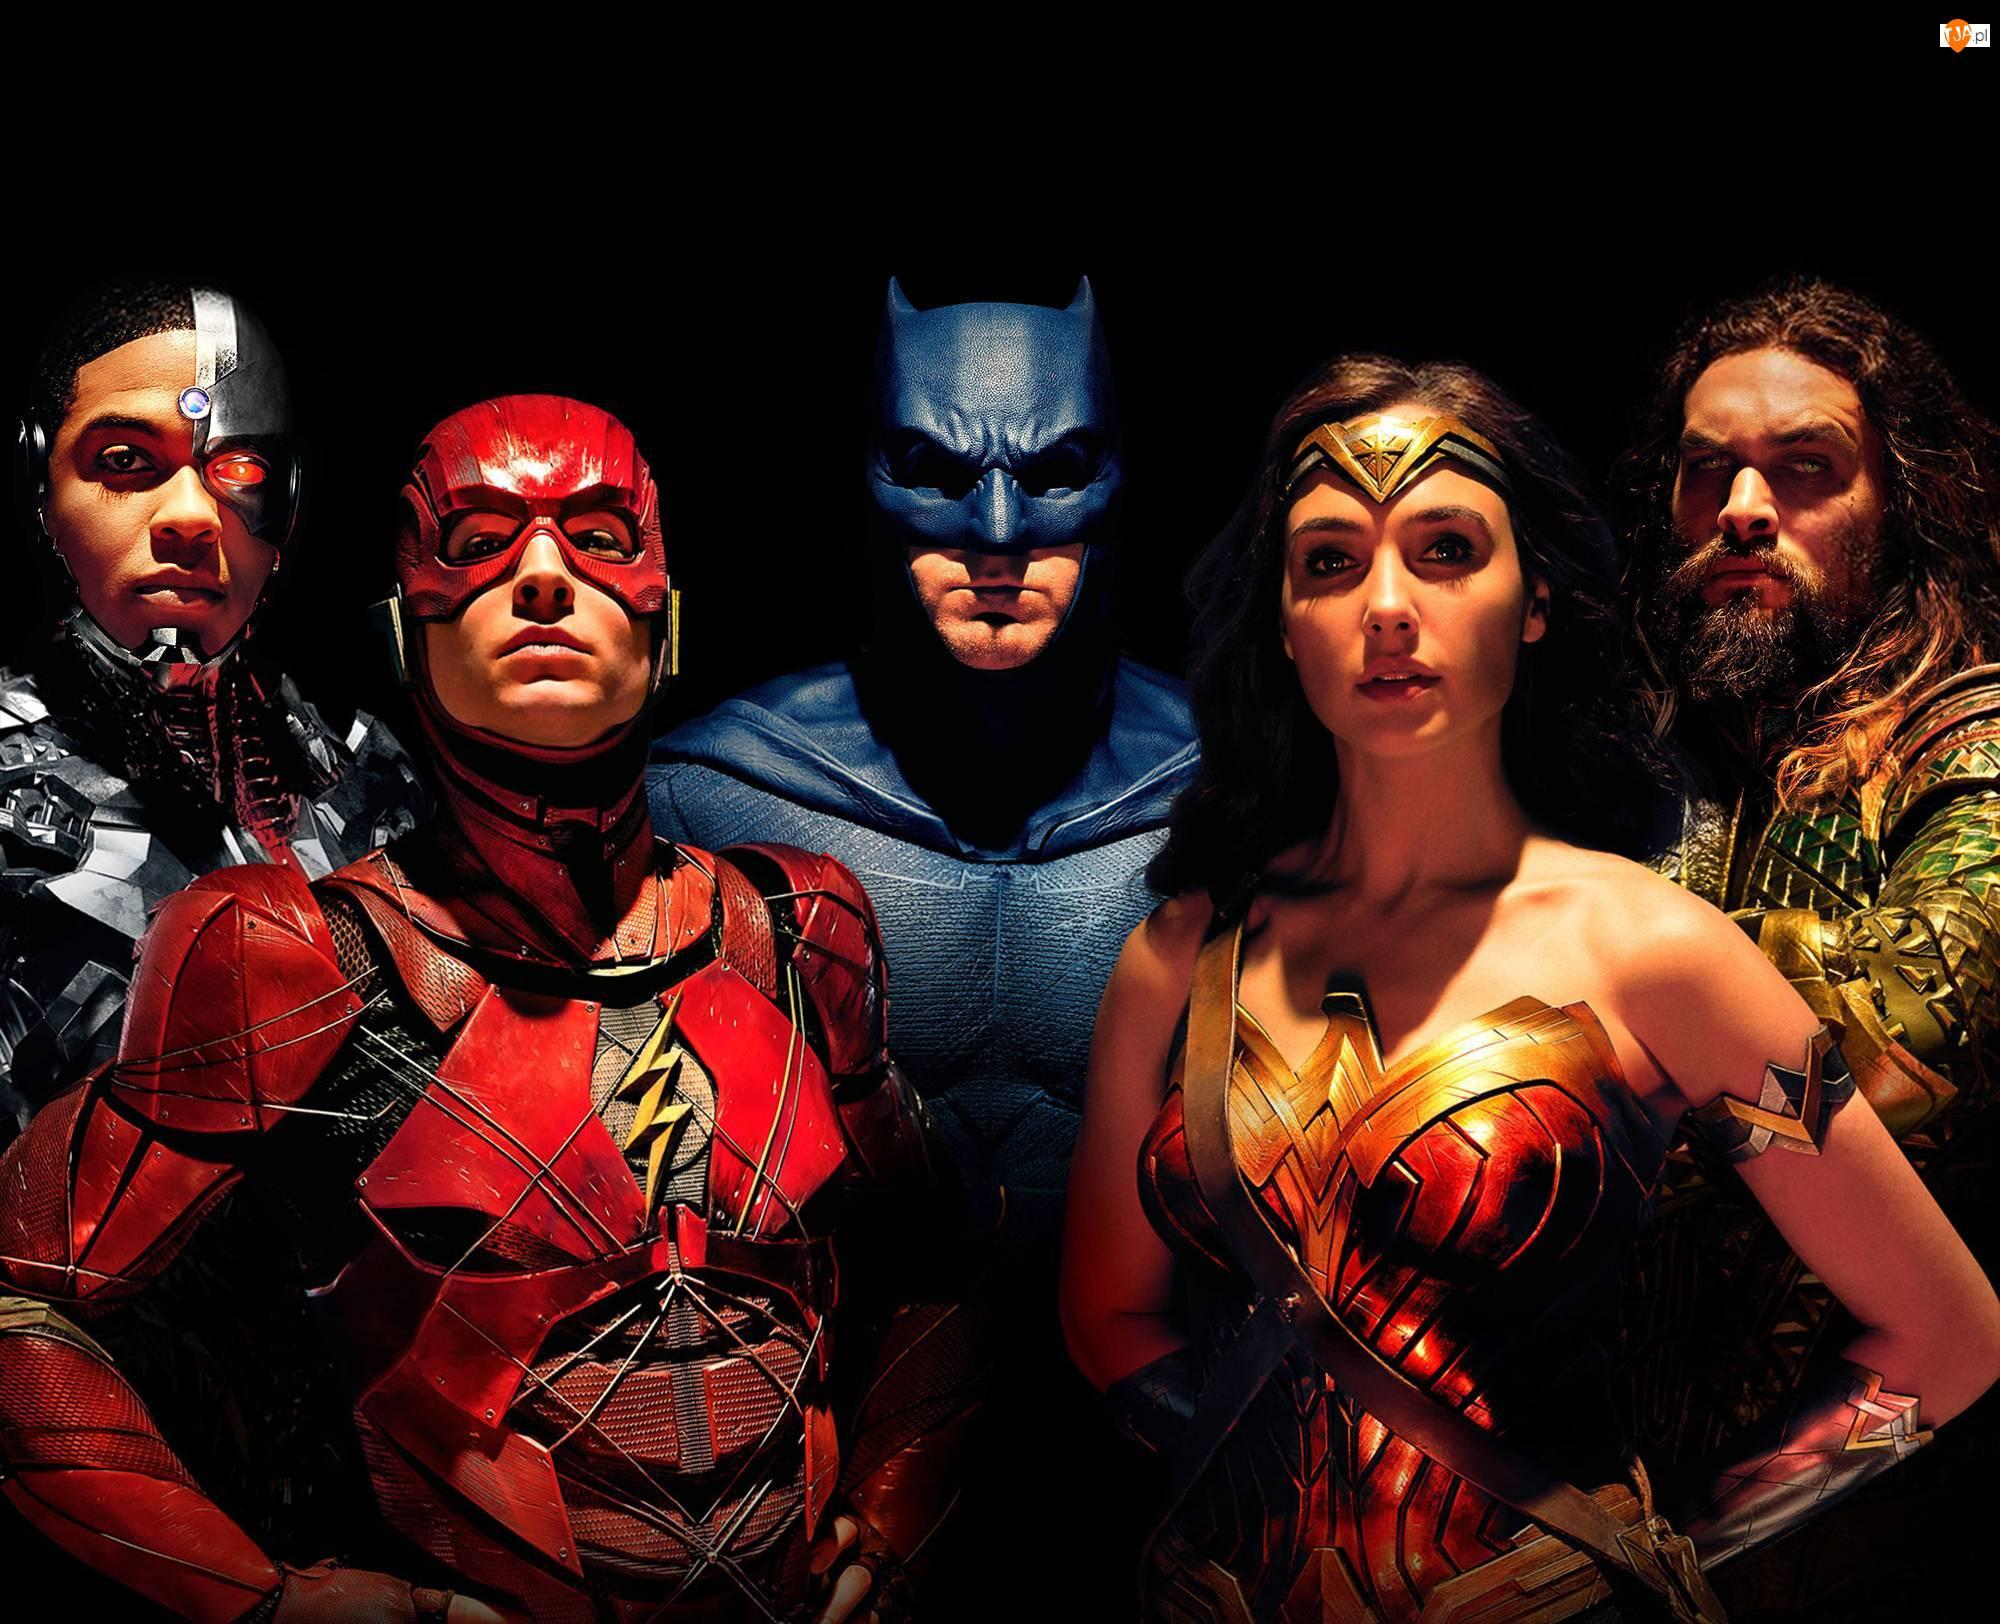 Ezra Miller - Flash, Ben Affleck - Batman, Liga Sprawiedliwości - Justice League, Film, Gal Gadot - Wonder Woman, Ray Fisher - Cyborg, Jason Momoa - Aquaman